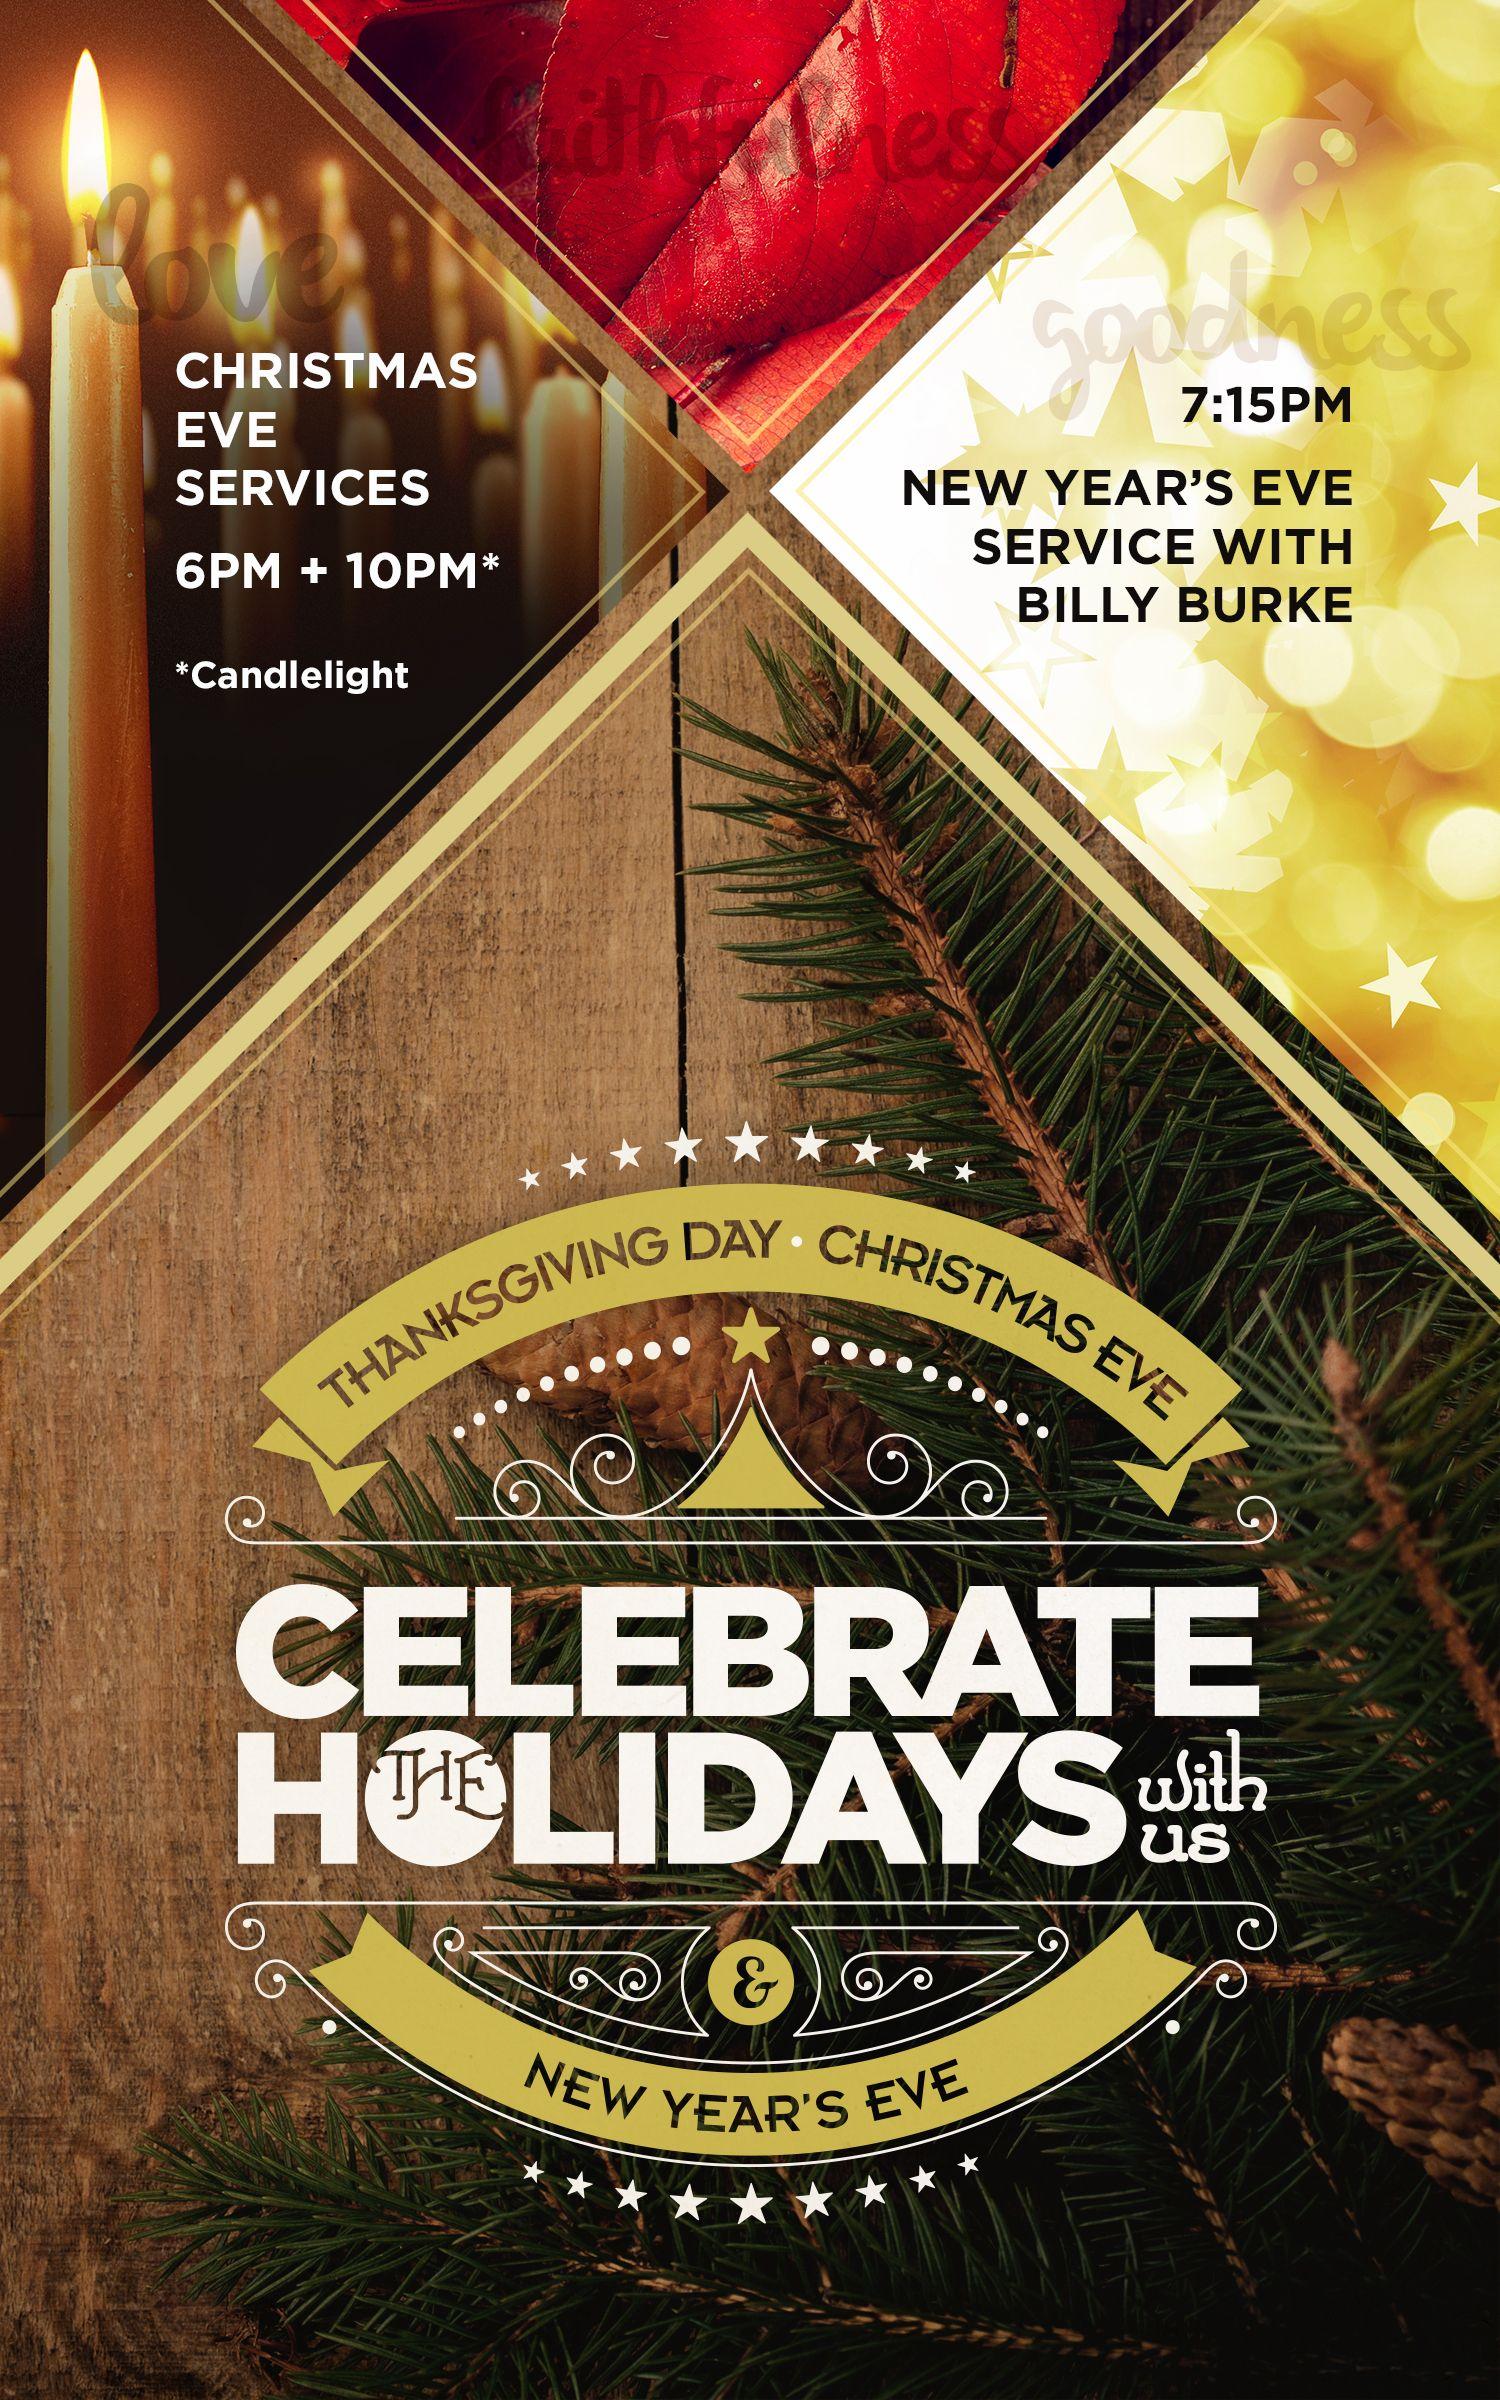 Holidays at FHC! | Sermon series, New years eve, Christmas eve